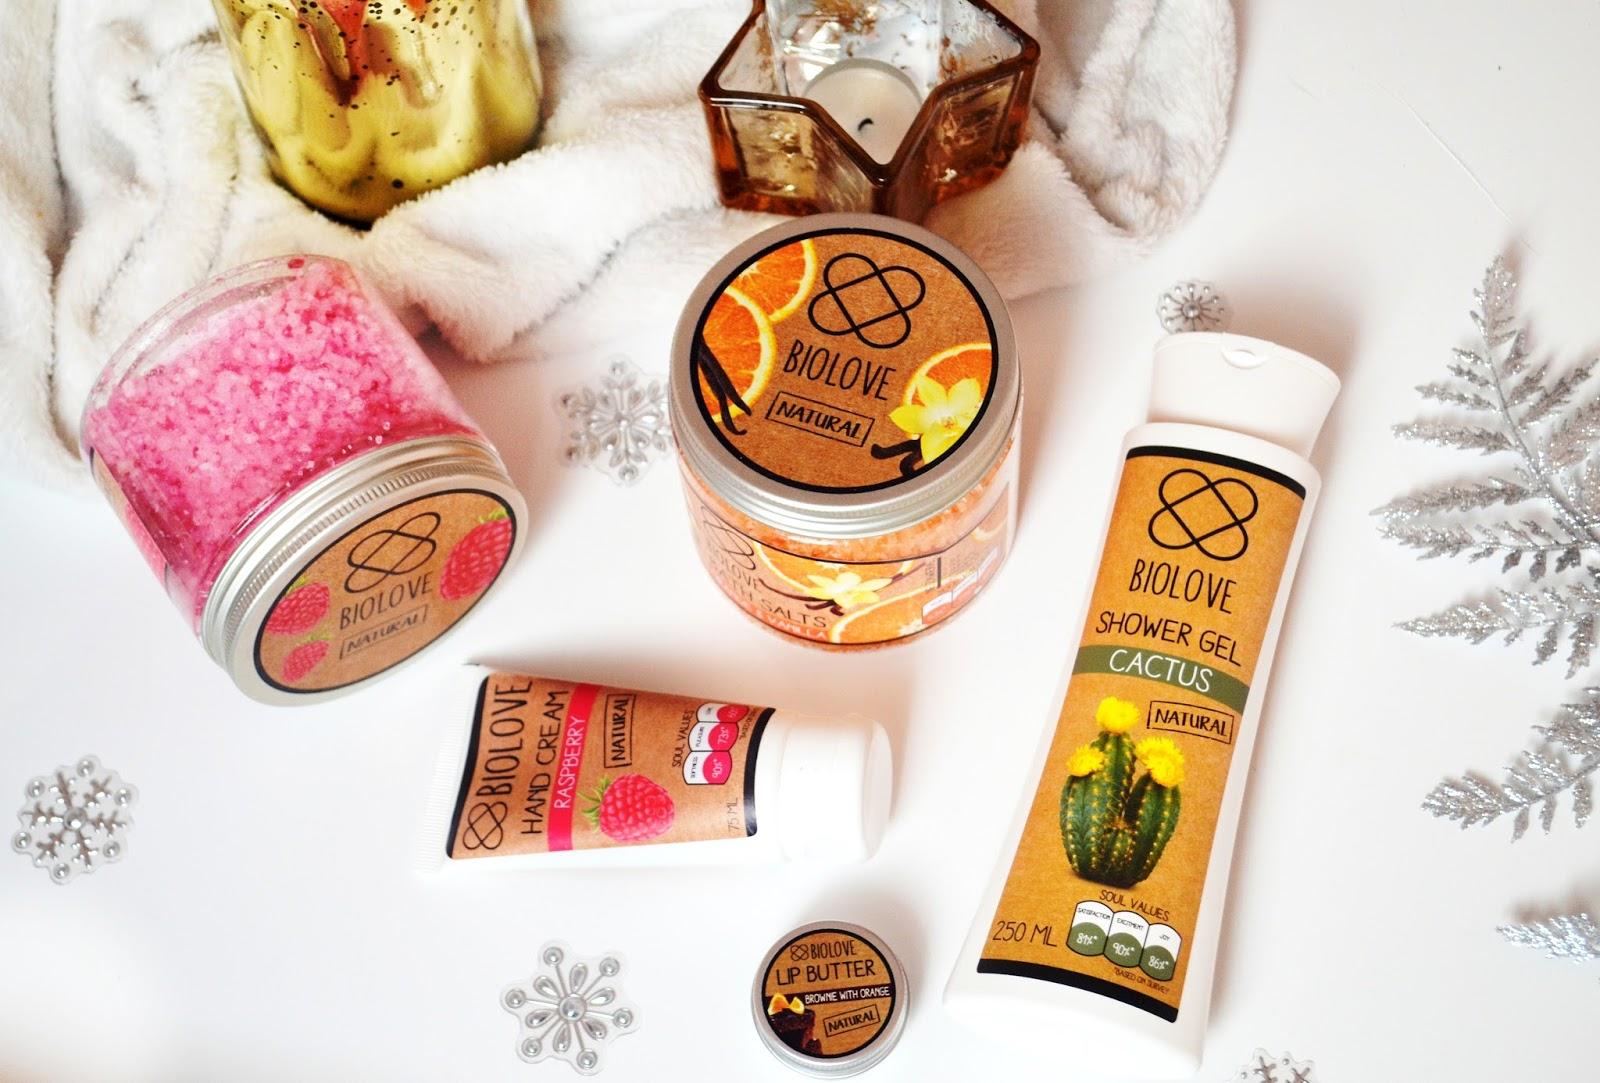 Naturalne kosmetyki BIOLOVE - co warto kupić?